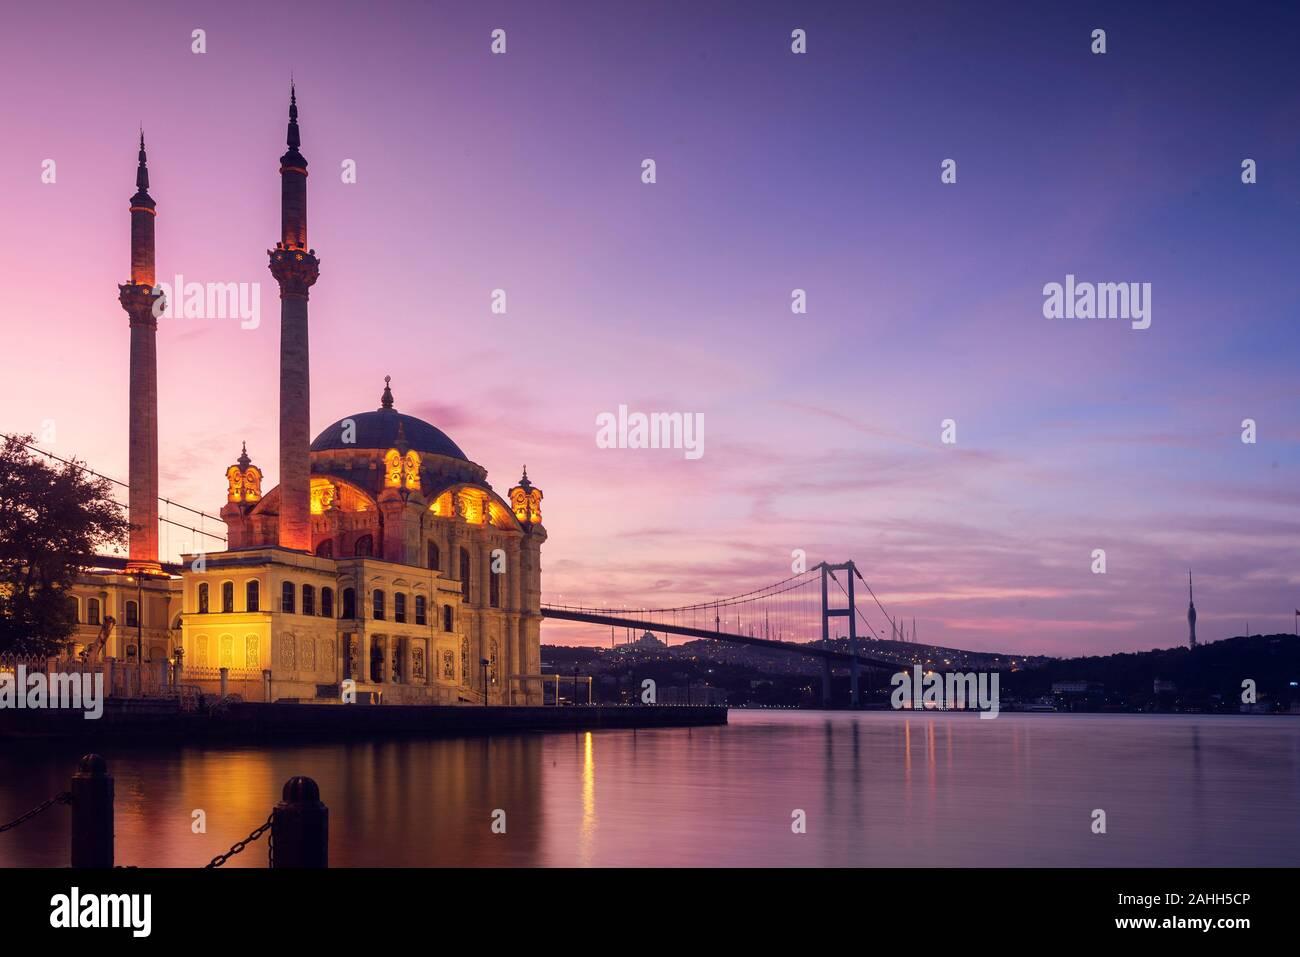 Sunrise view Ortakoy Mosque and Bosphorus Bridge, Best touristic Place of Istanbul. Stock Photo